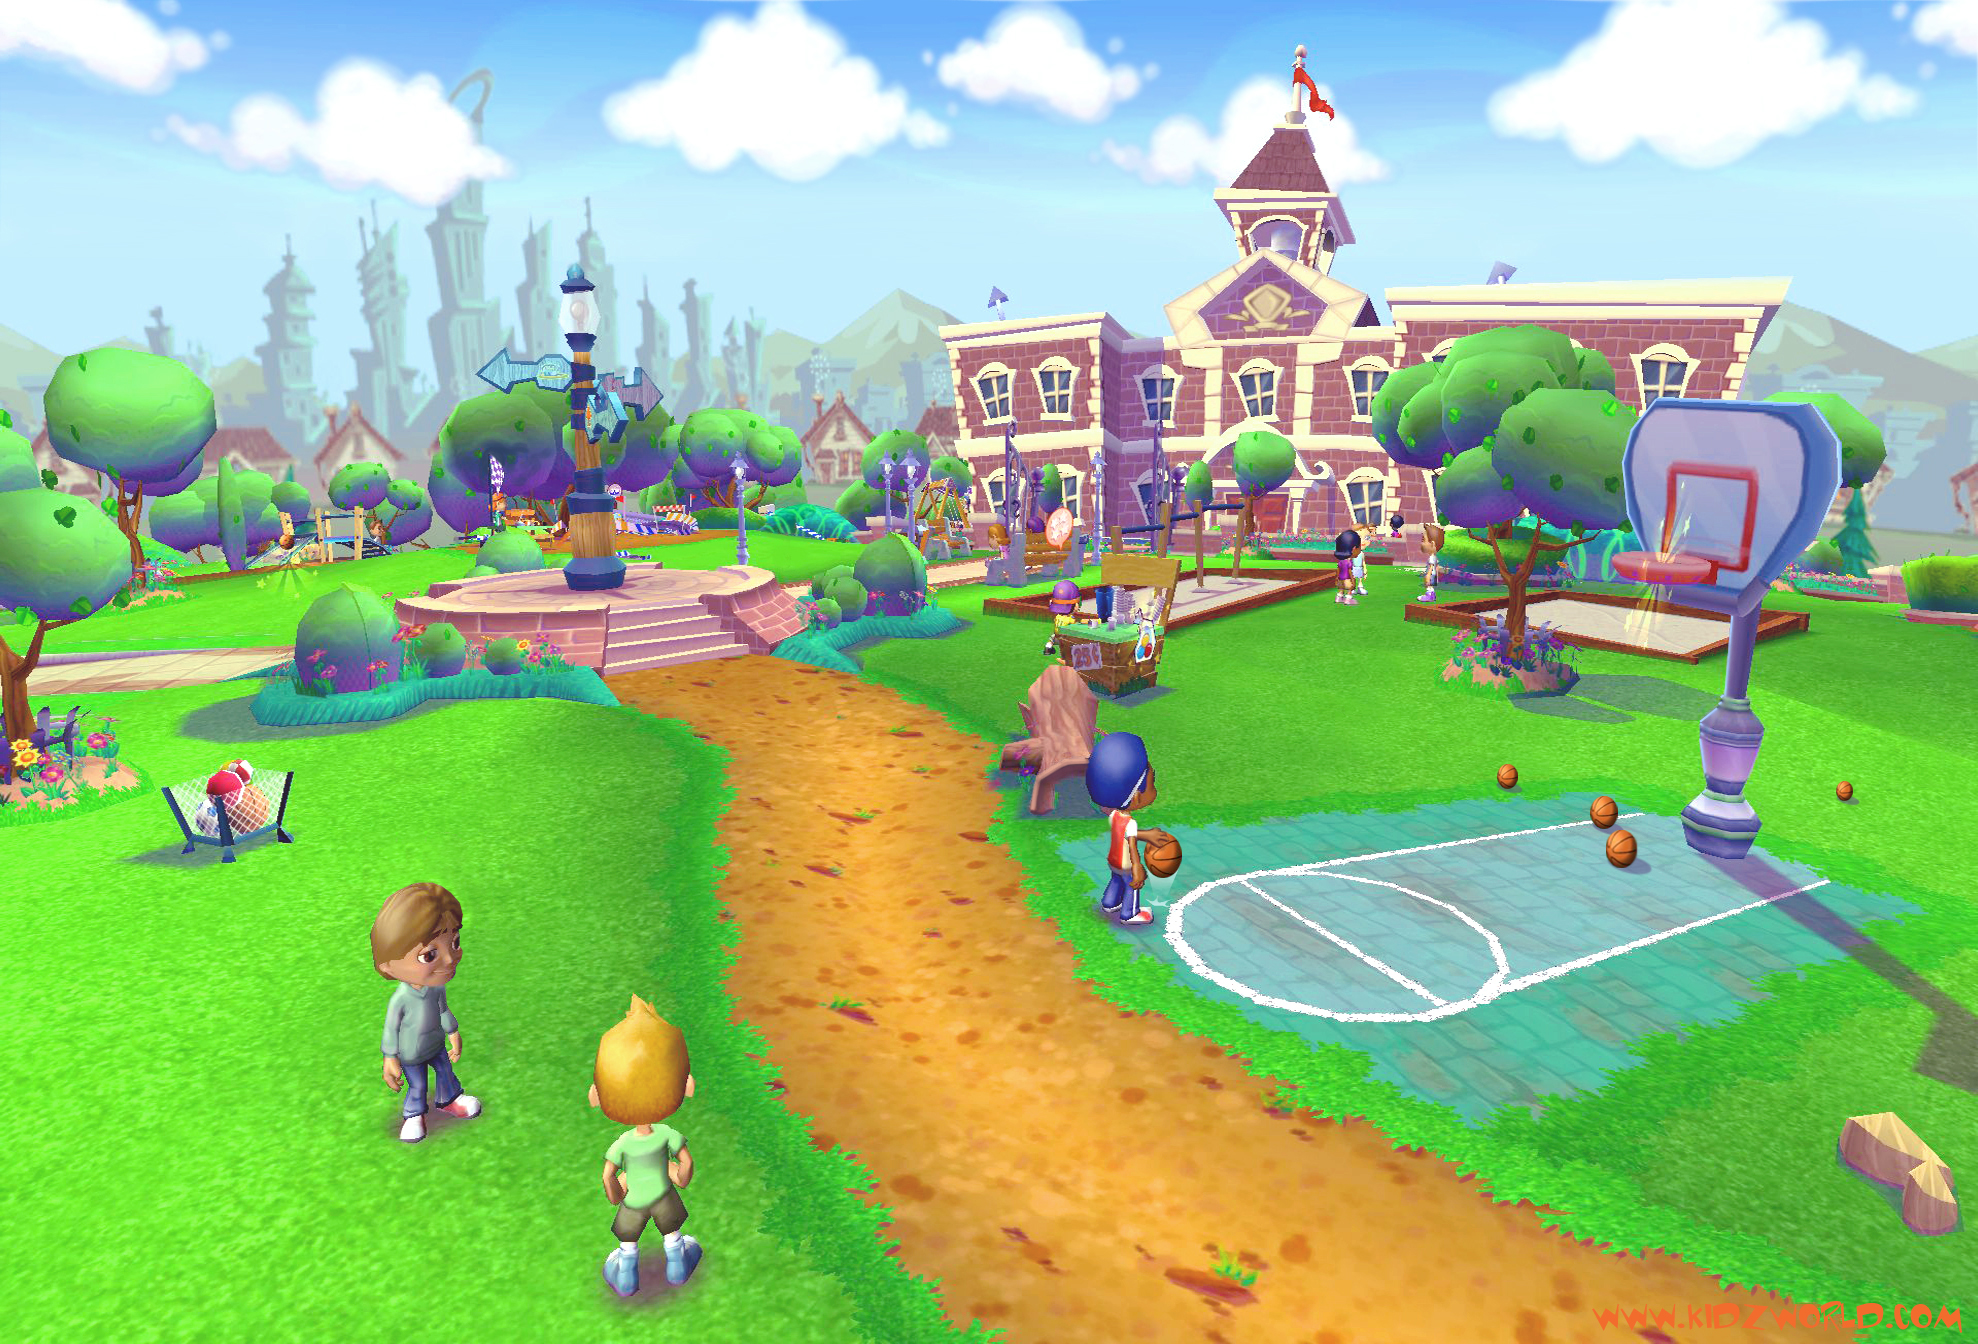 EA Studio Showcase 07 Video Game Previews | The Simpsons | skate ...